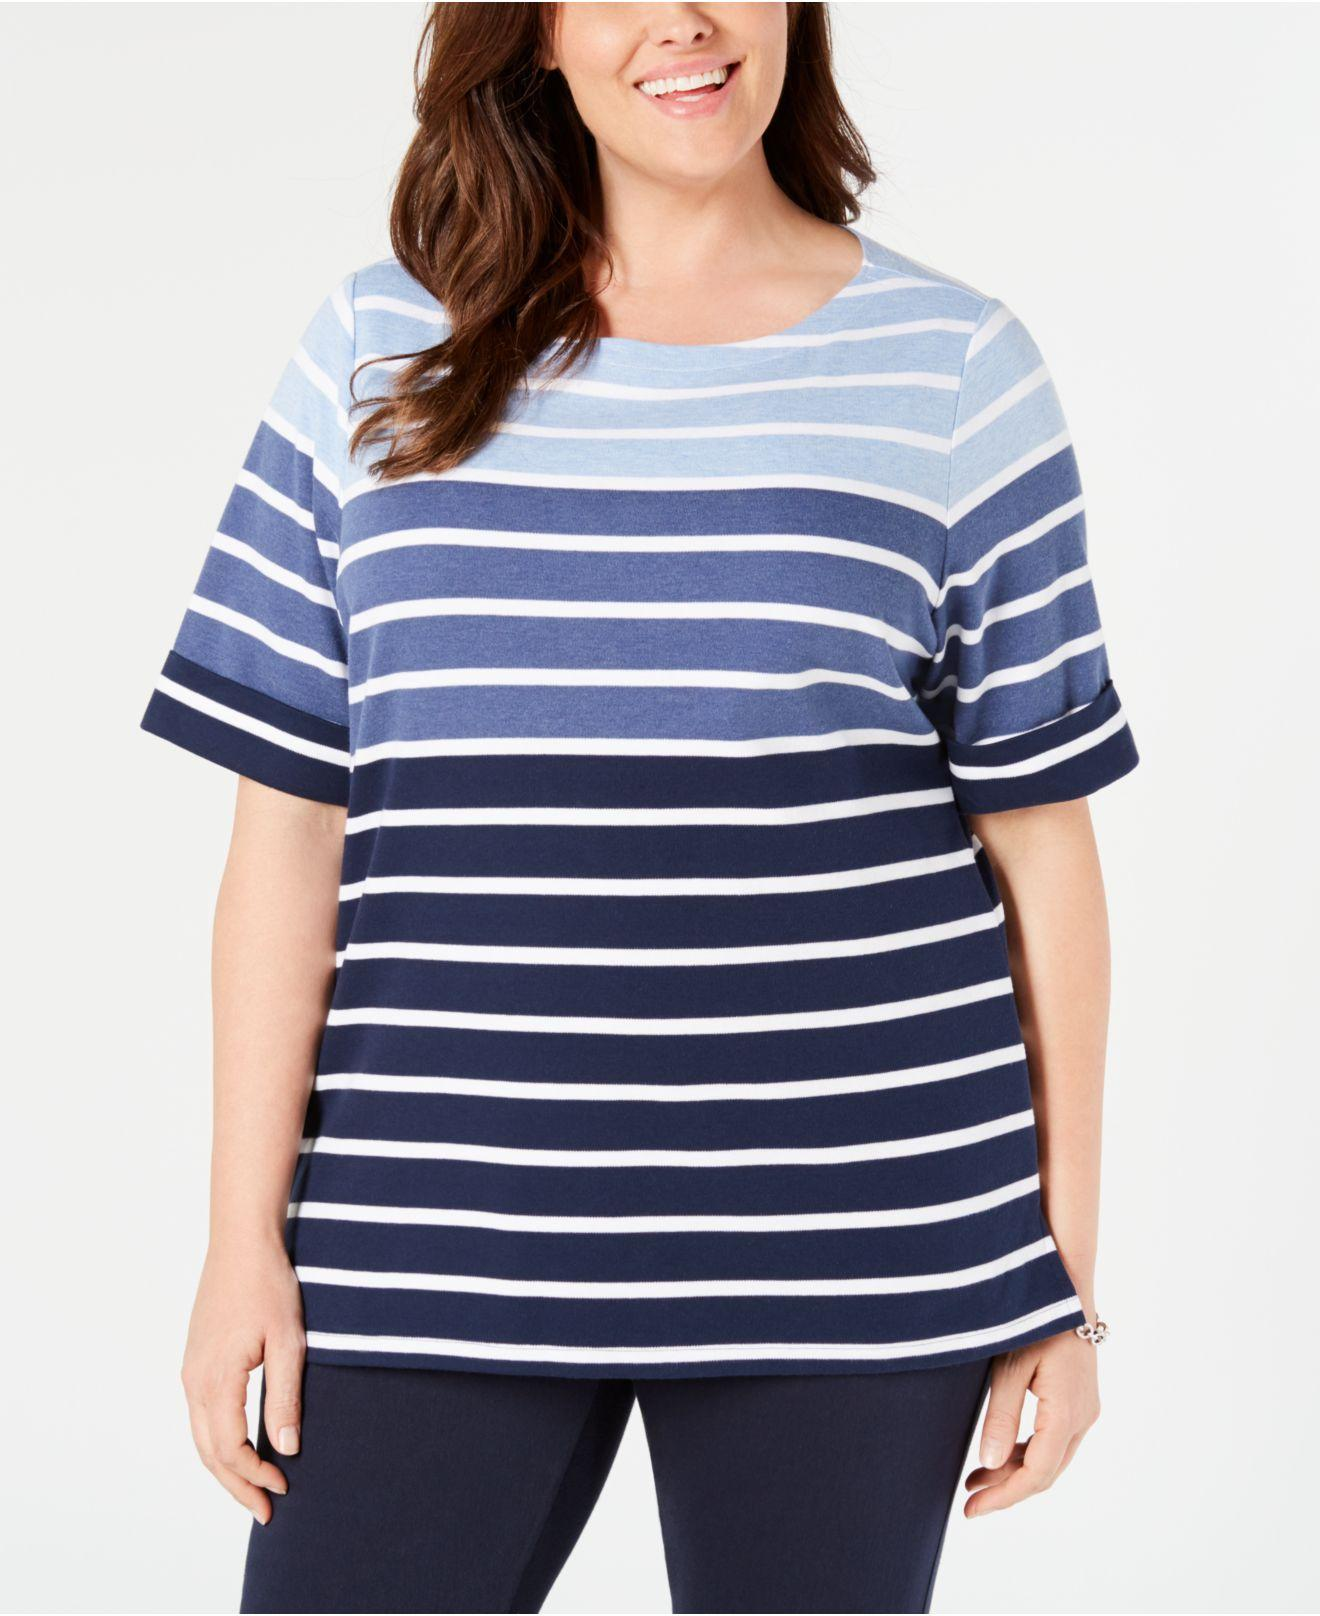 2b5553f9b72 Karen Scott. Women s Blue Plus Size Boat-neck Striped Top